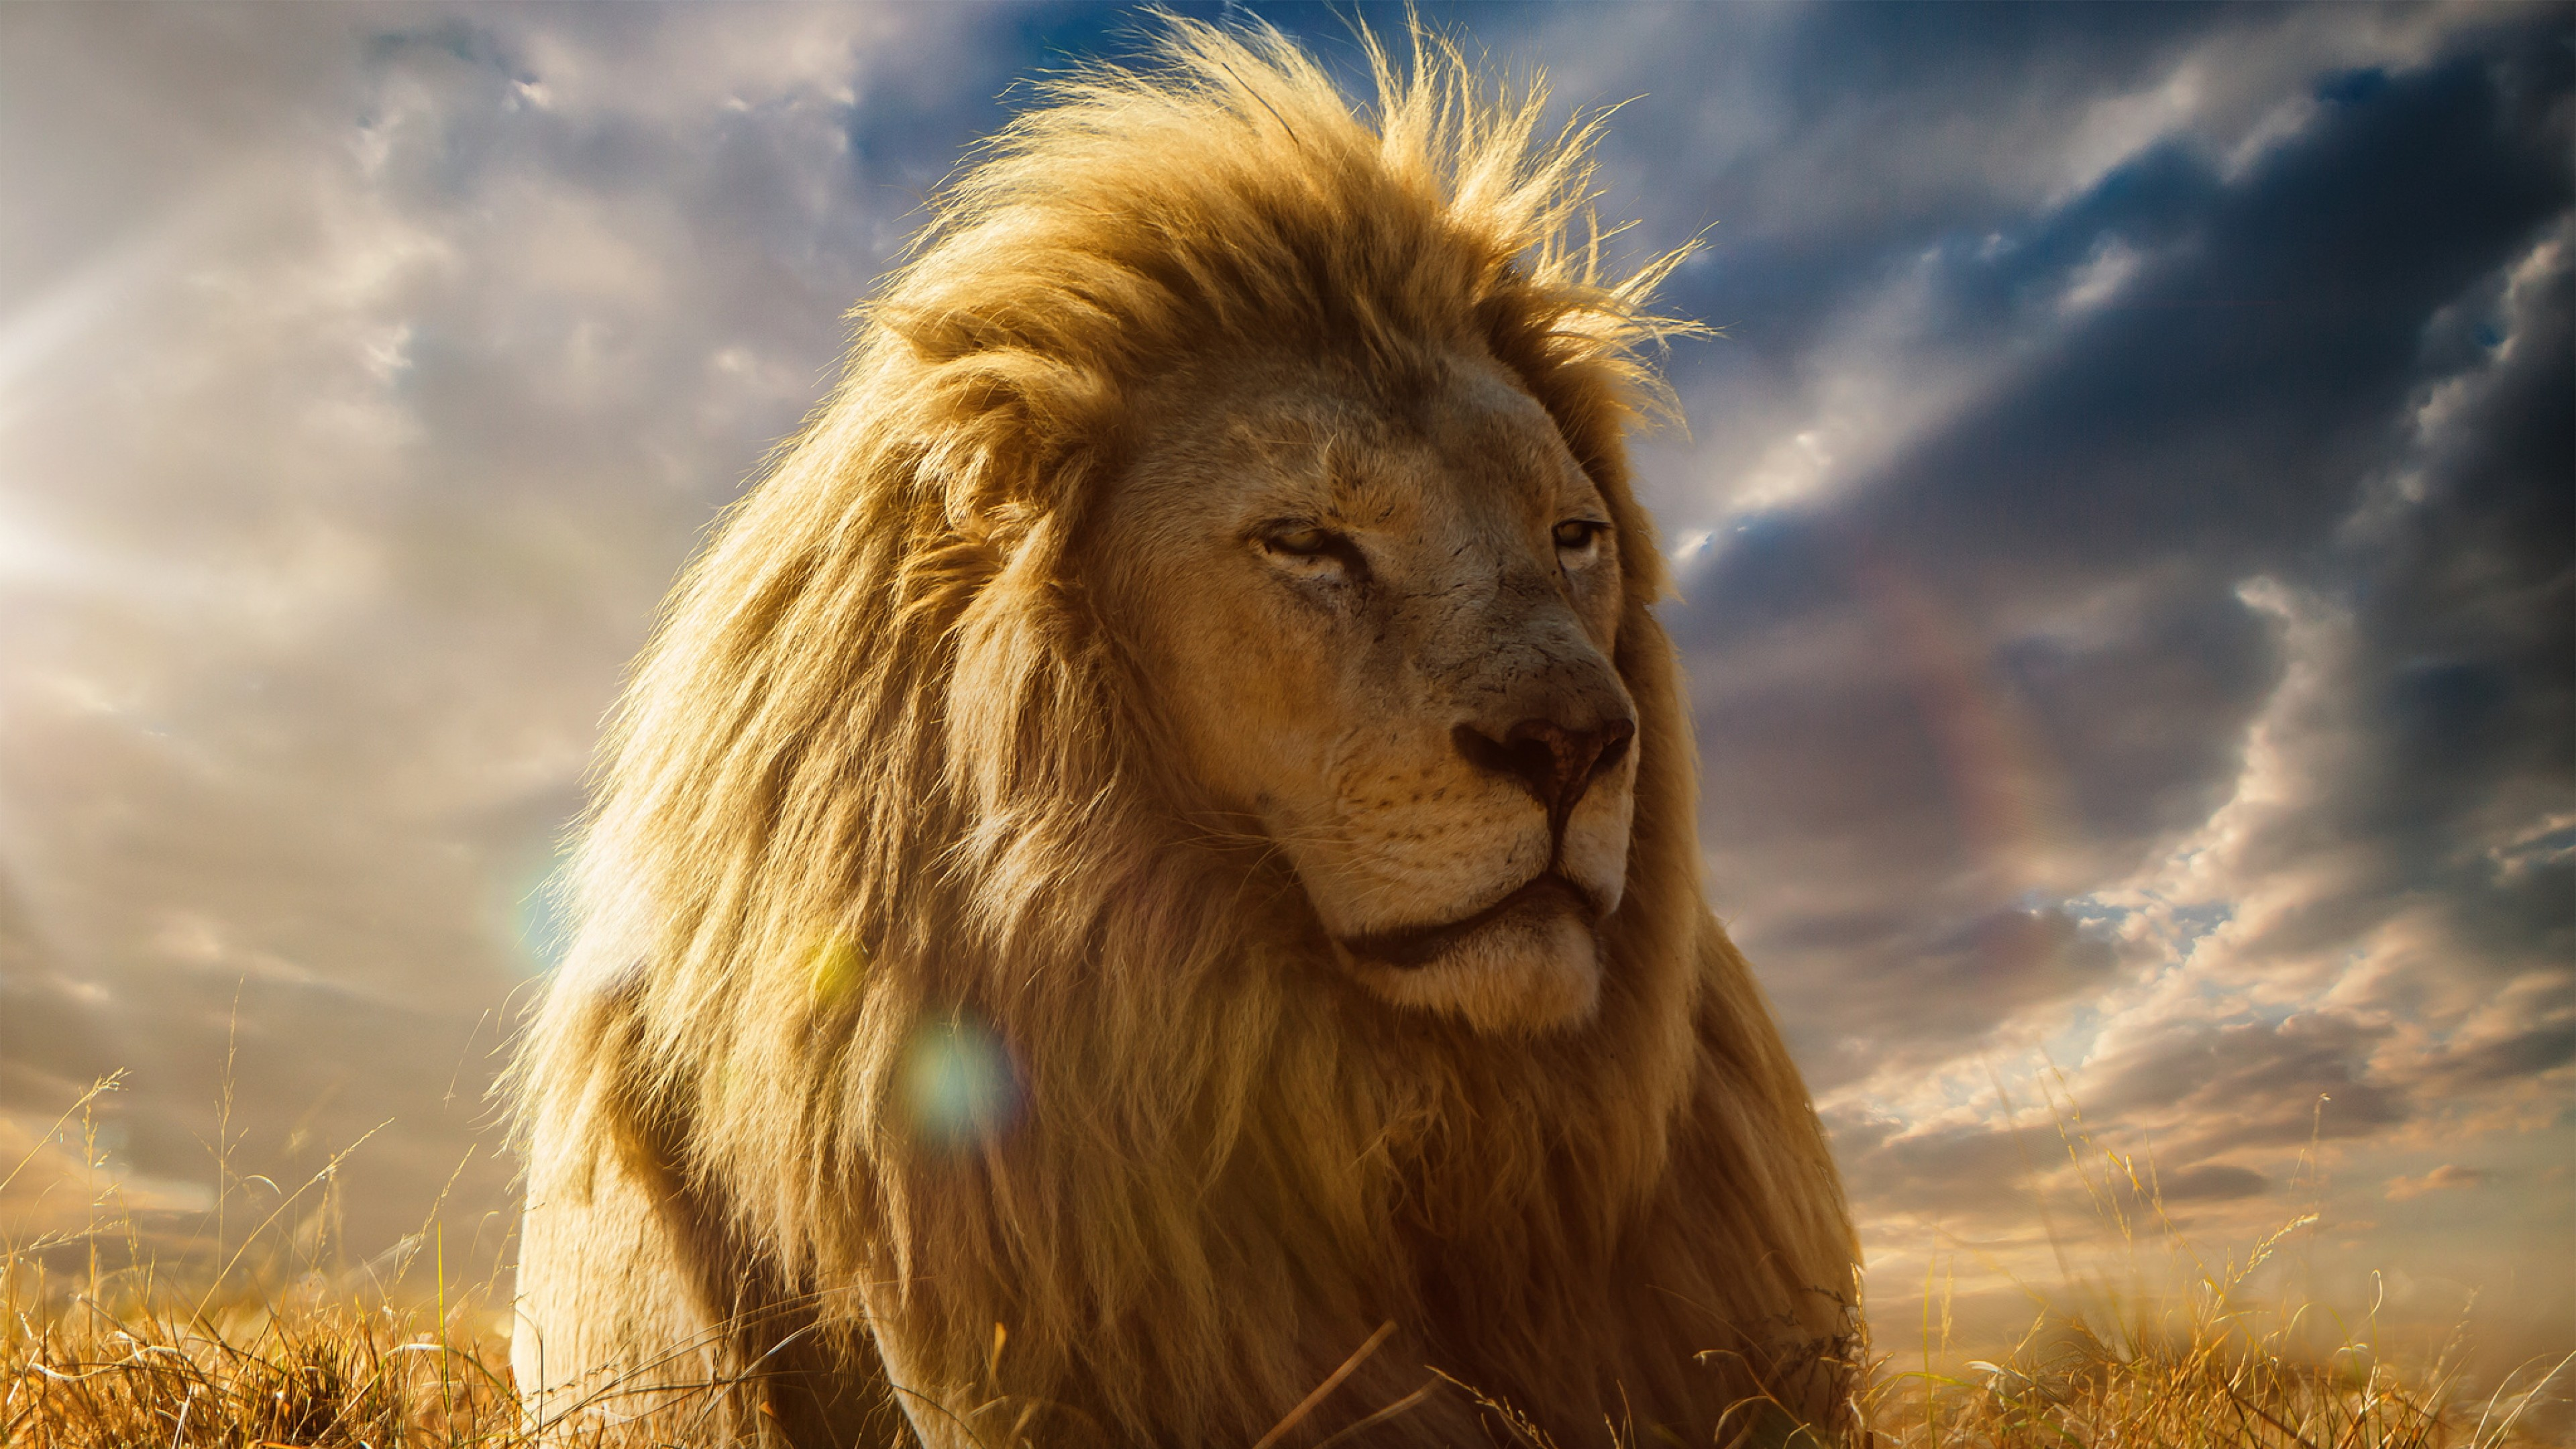 Preview wallpaper lion, king of beasts, mane, savannah 3840×2160